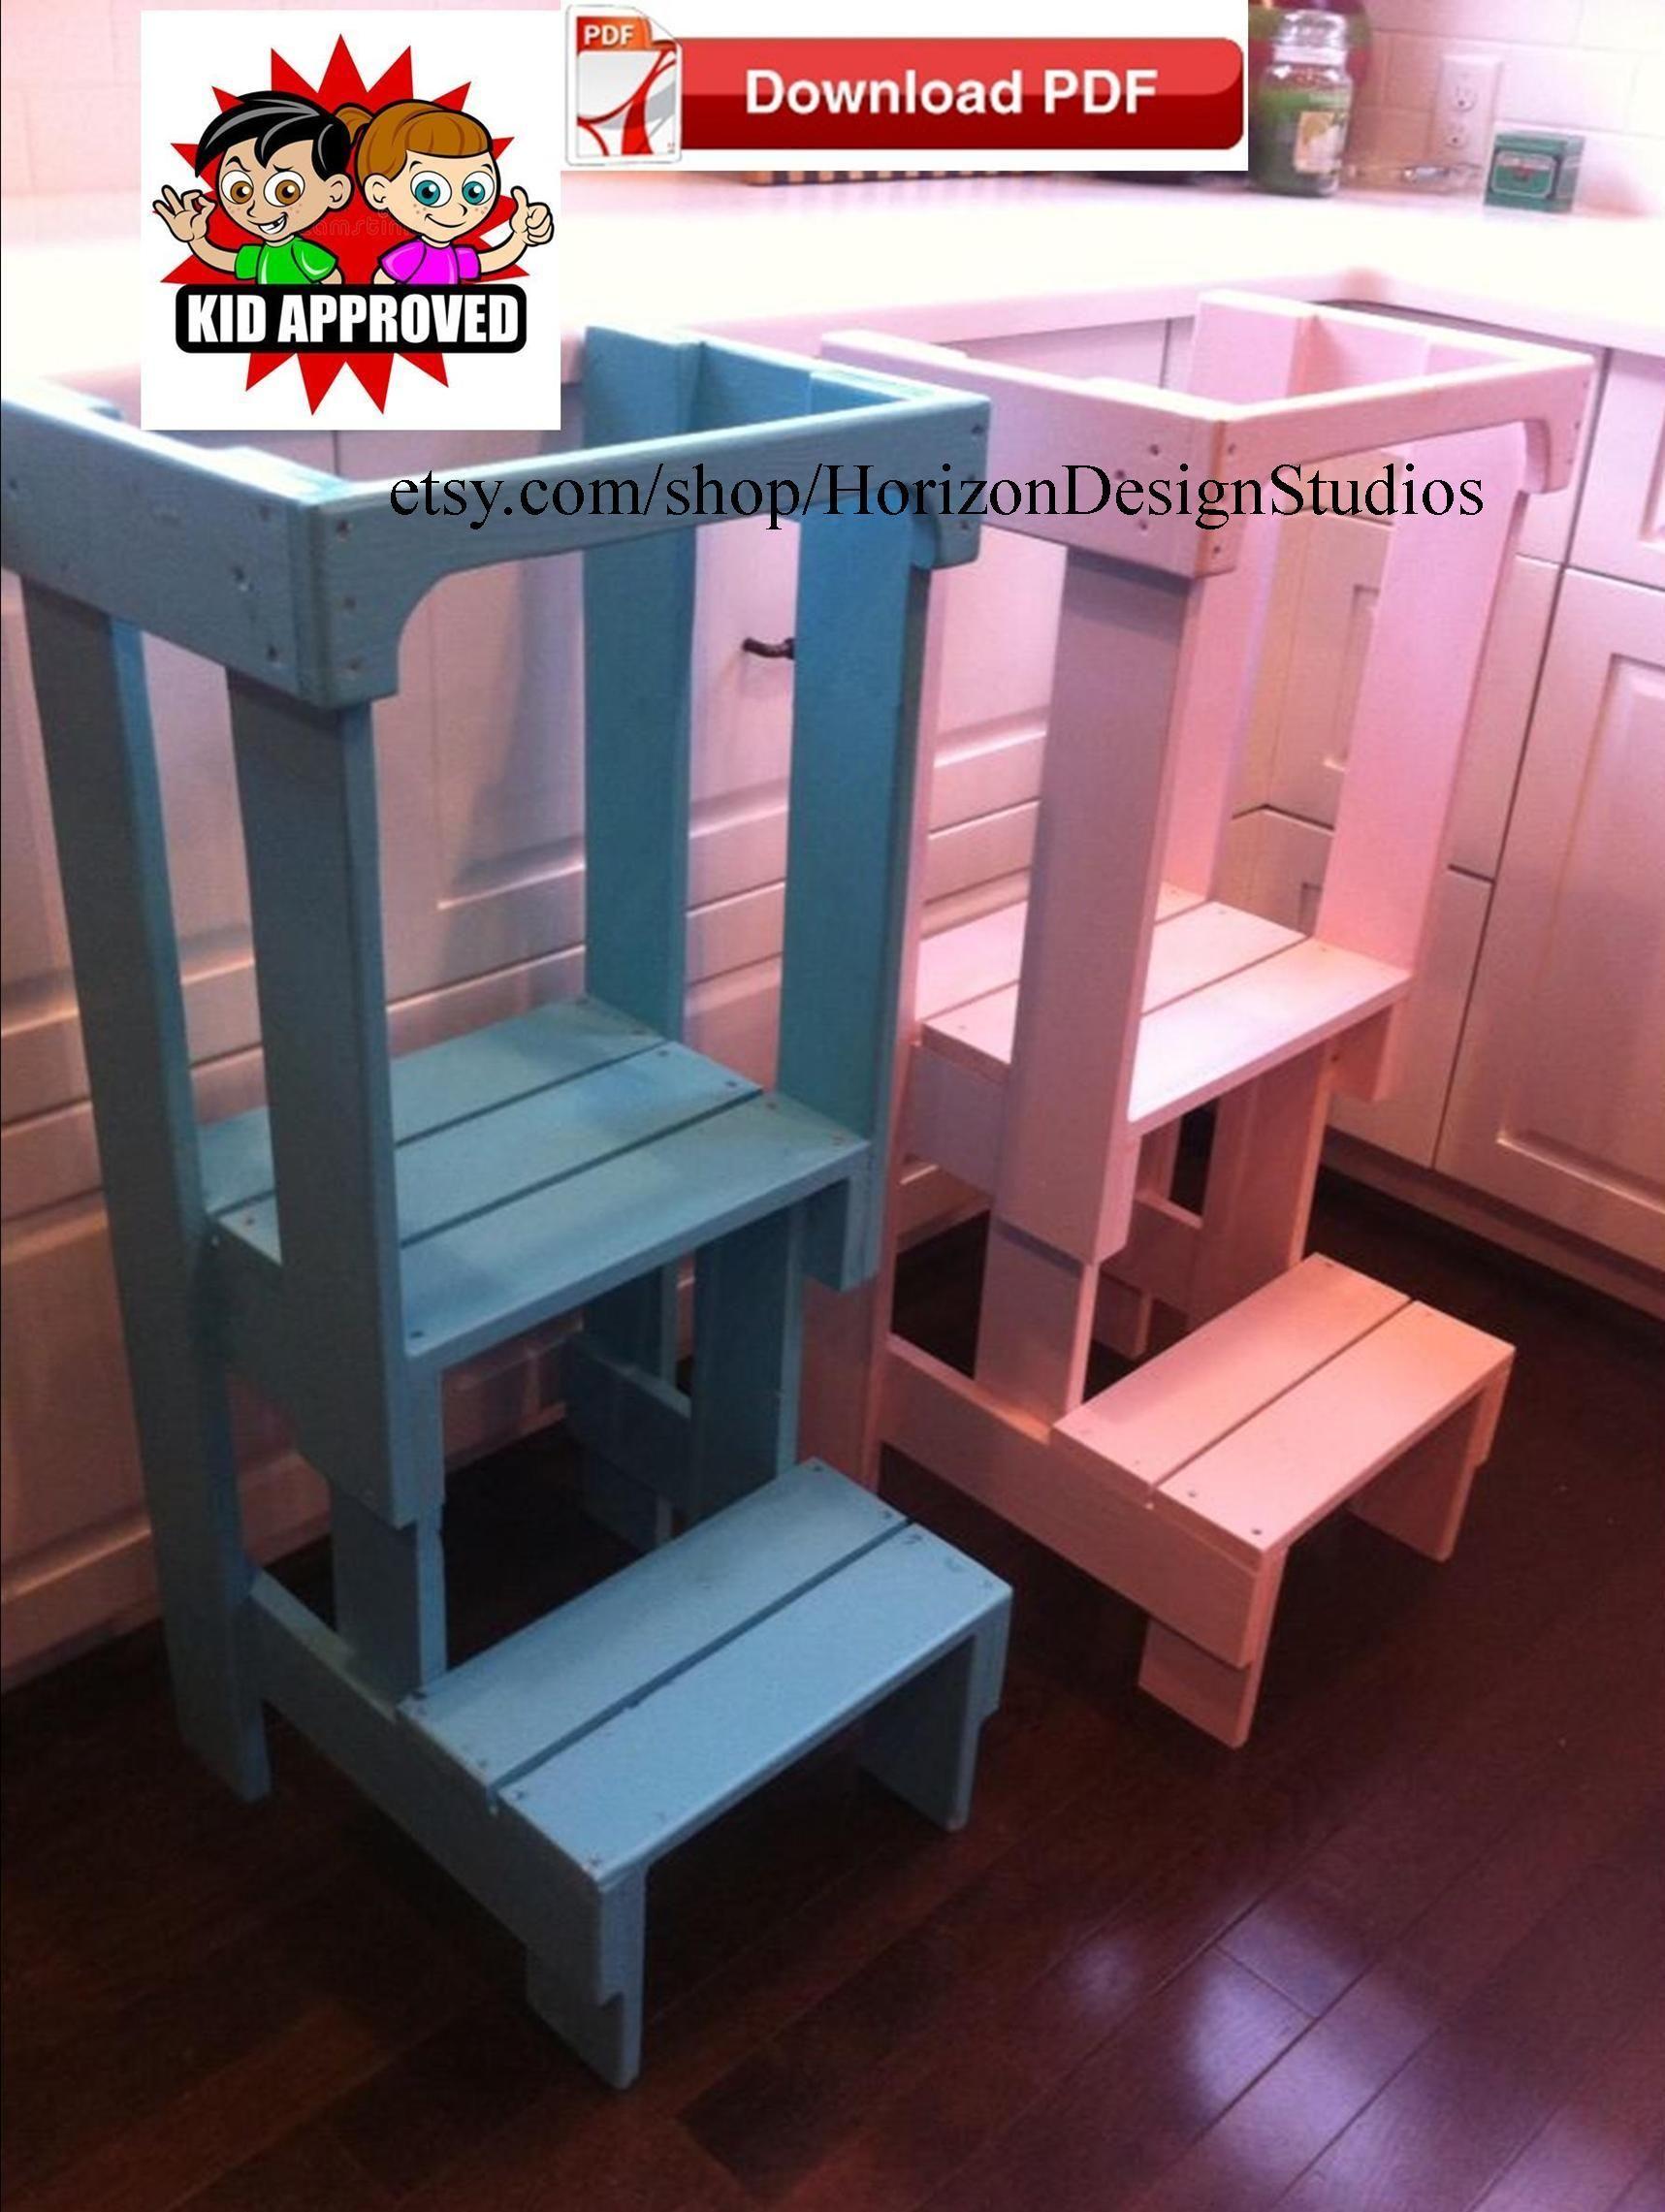 Diy Pdf Plan To Build A Toddler Tower Learning Tower Kitchen Stools Diy Kitchen Step Stool Diy Kids Kitchen